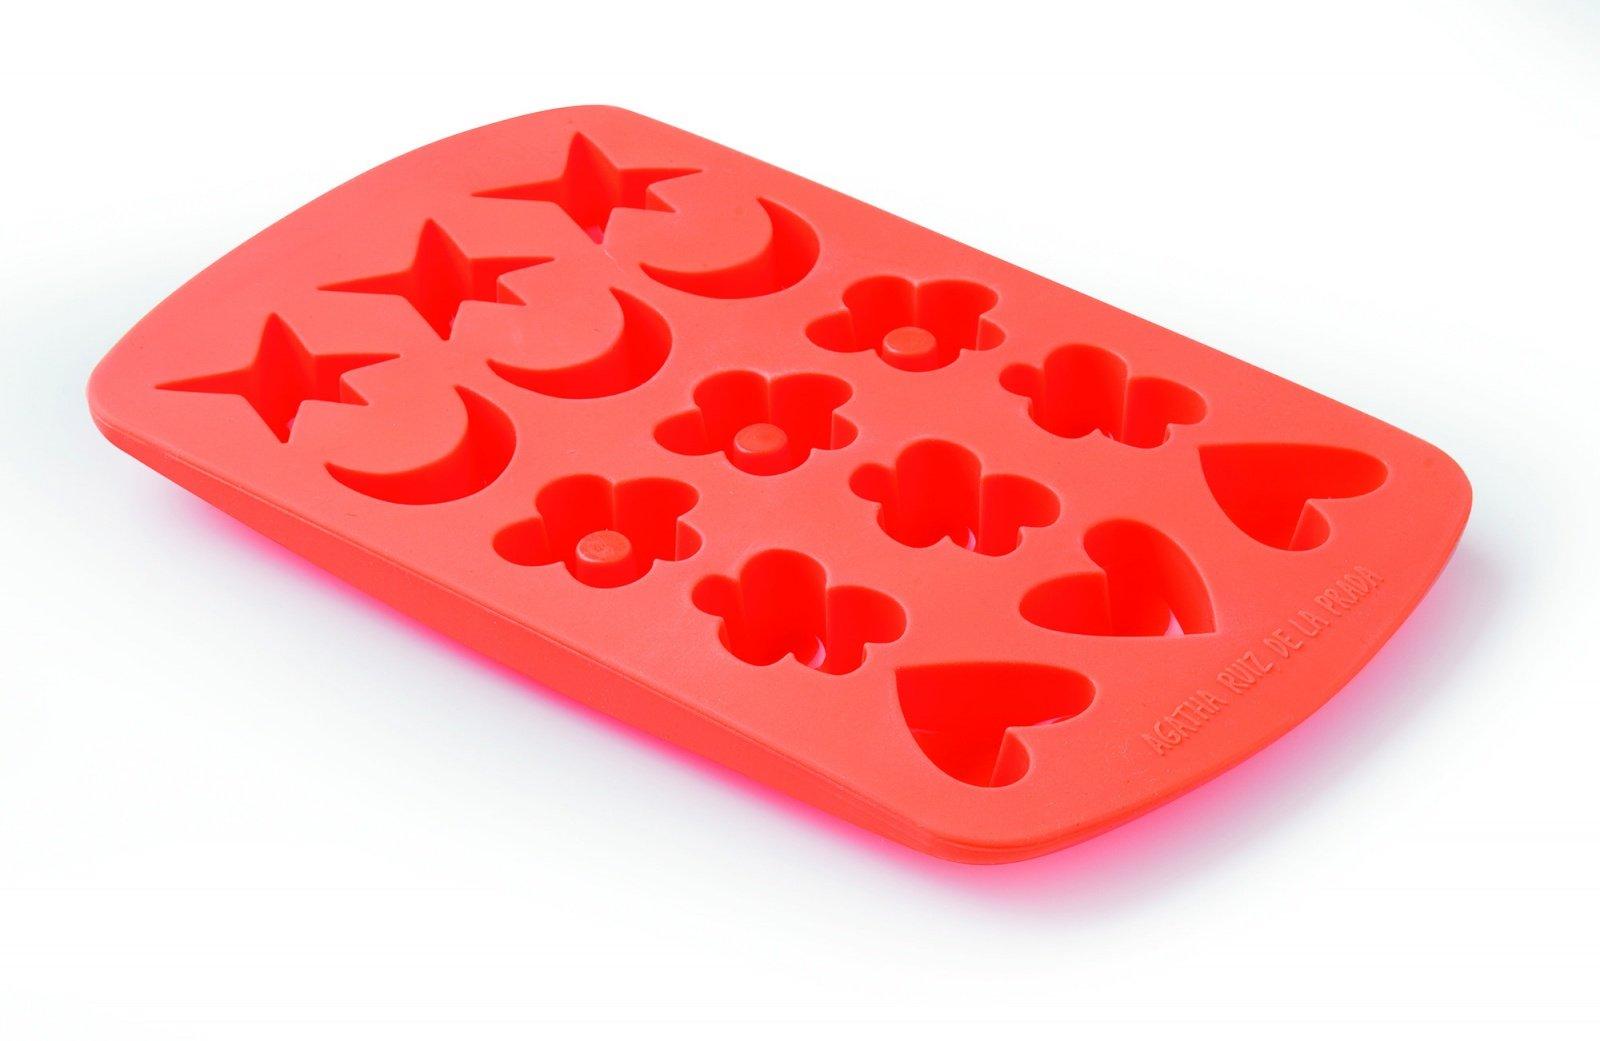 "Форма для шоколадных и мармеладных конфет ""Ассорти"" AGATHA Lekue: месяц, сердечко, звезда, цветок, оранжевая"